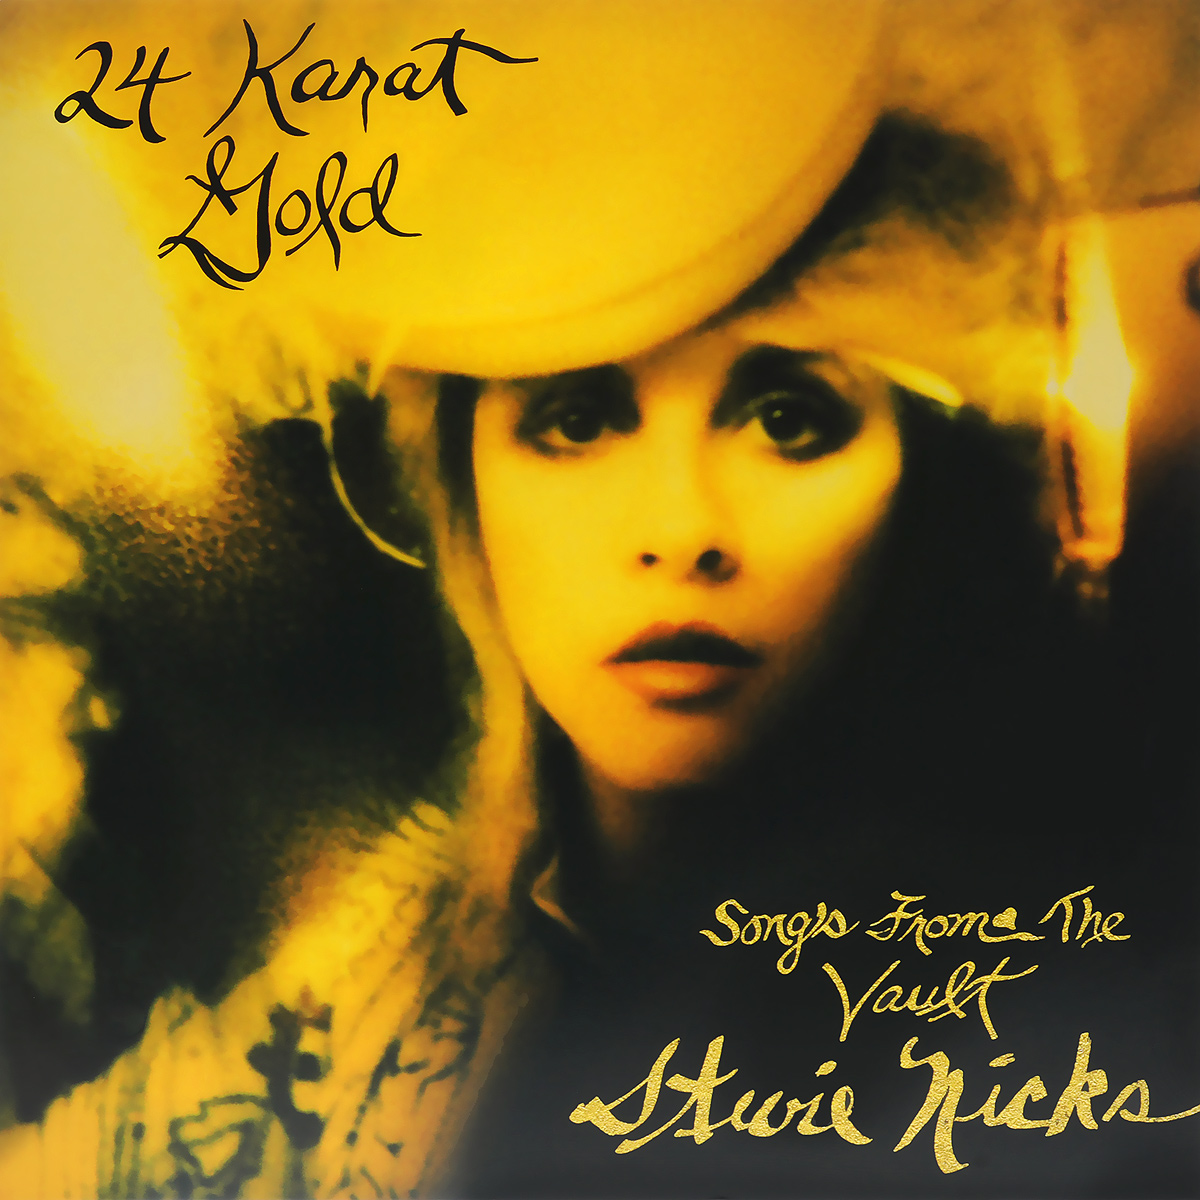 Стиви Никс Stevie Nicks. 24 Karat Gold. Songs From The Vault (2 LP) виниловая пластинка stevie nicks 24 karat gold songs from the vault 2 lp